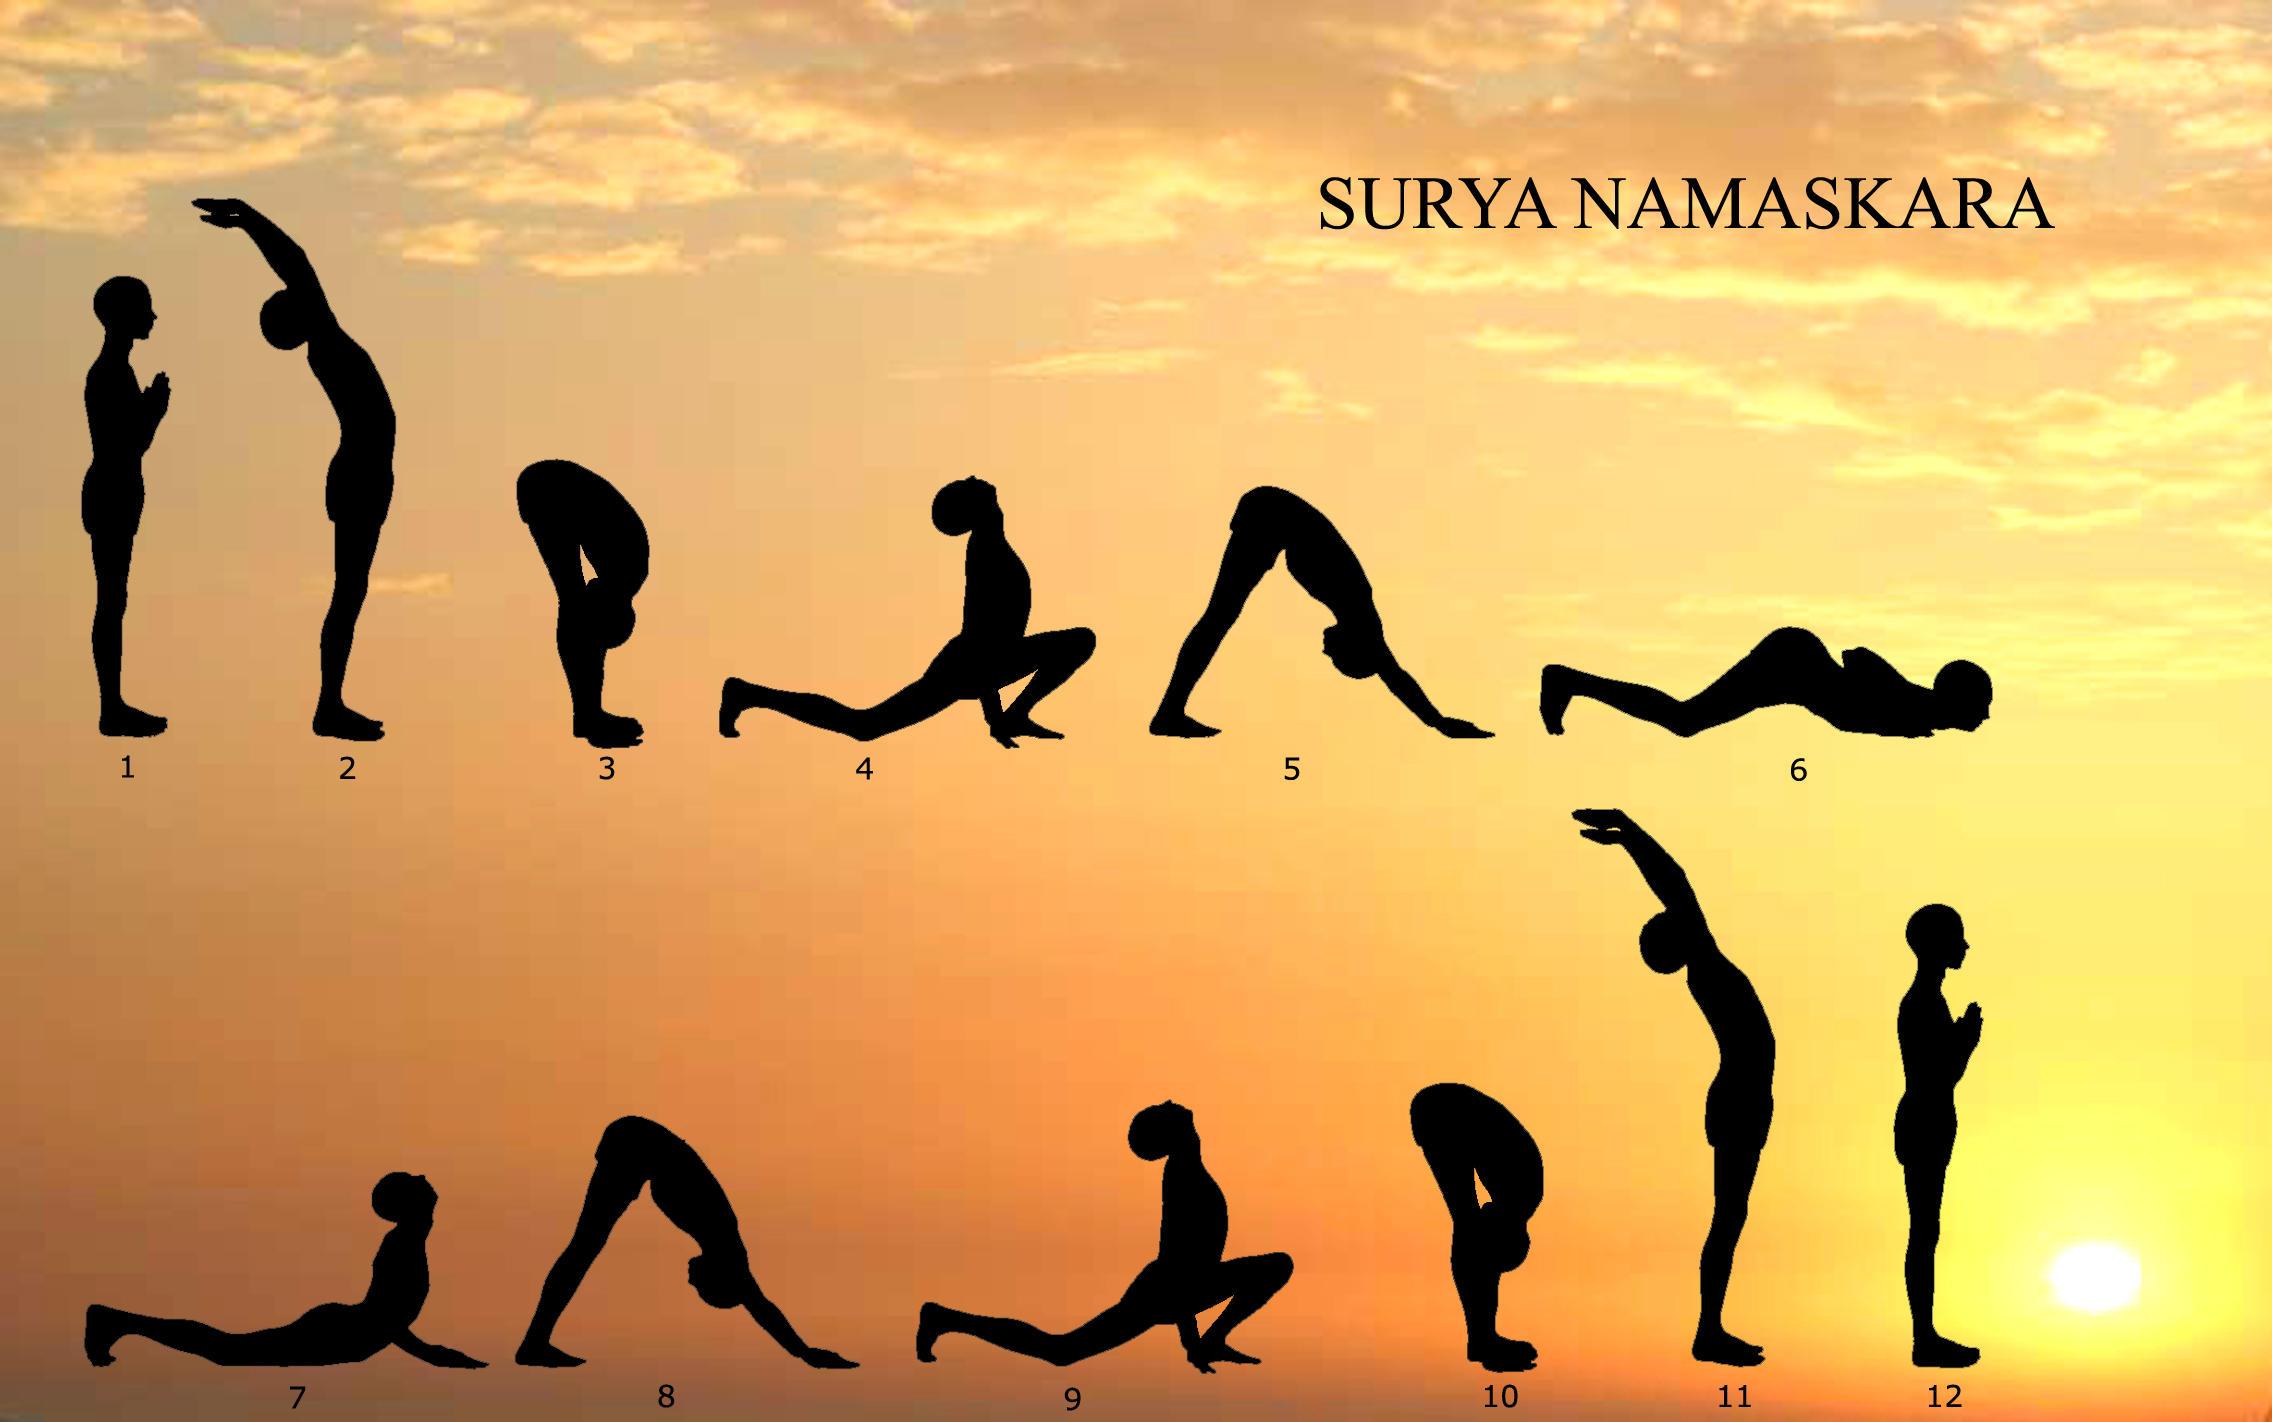 http://carriehura.abmp.com/images/yoga-sun-salutation-surya-namaskar2.jpg